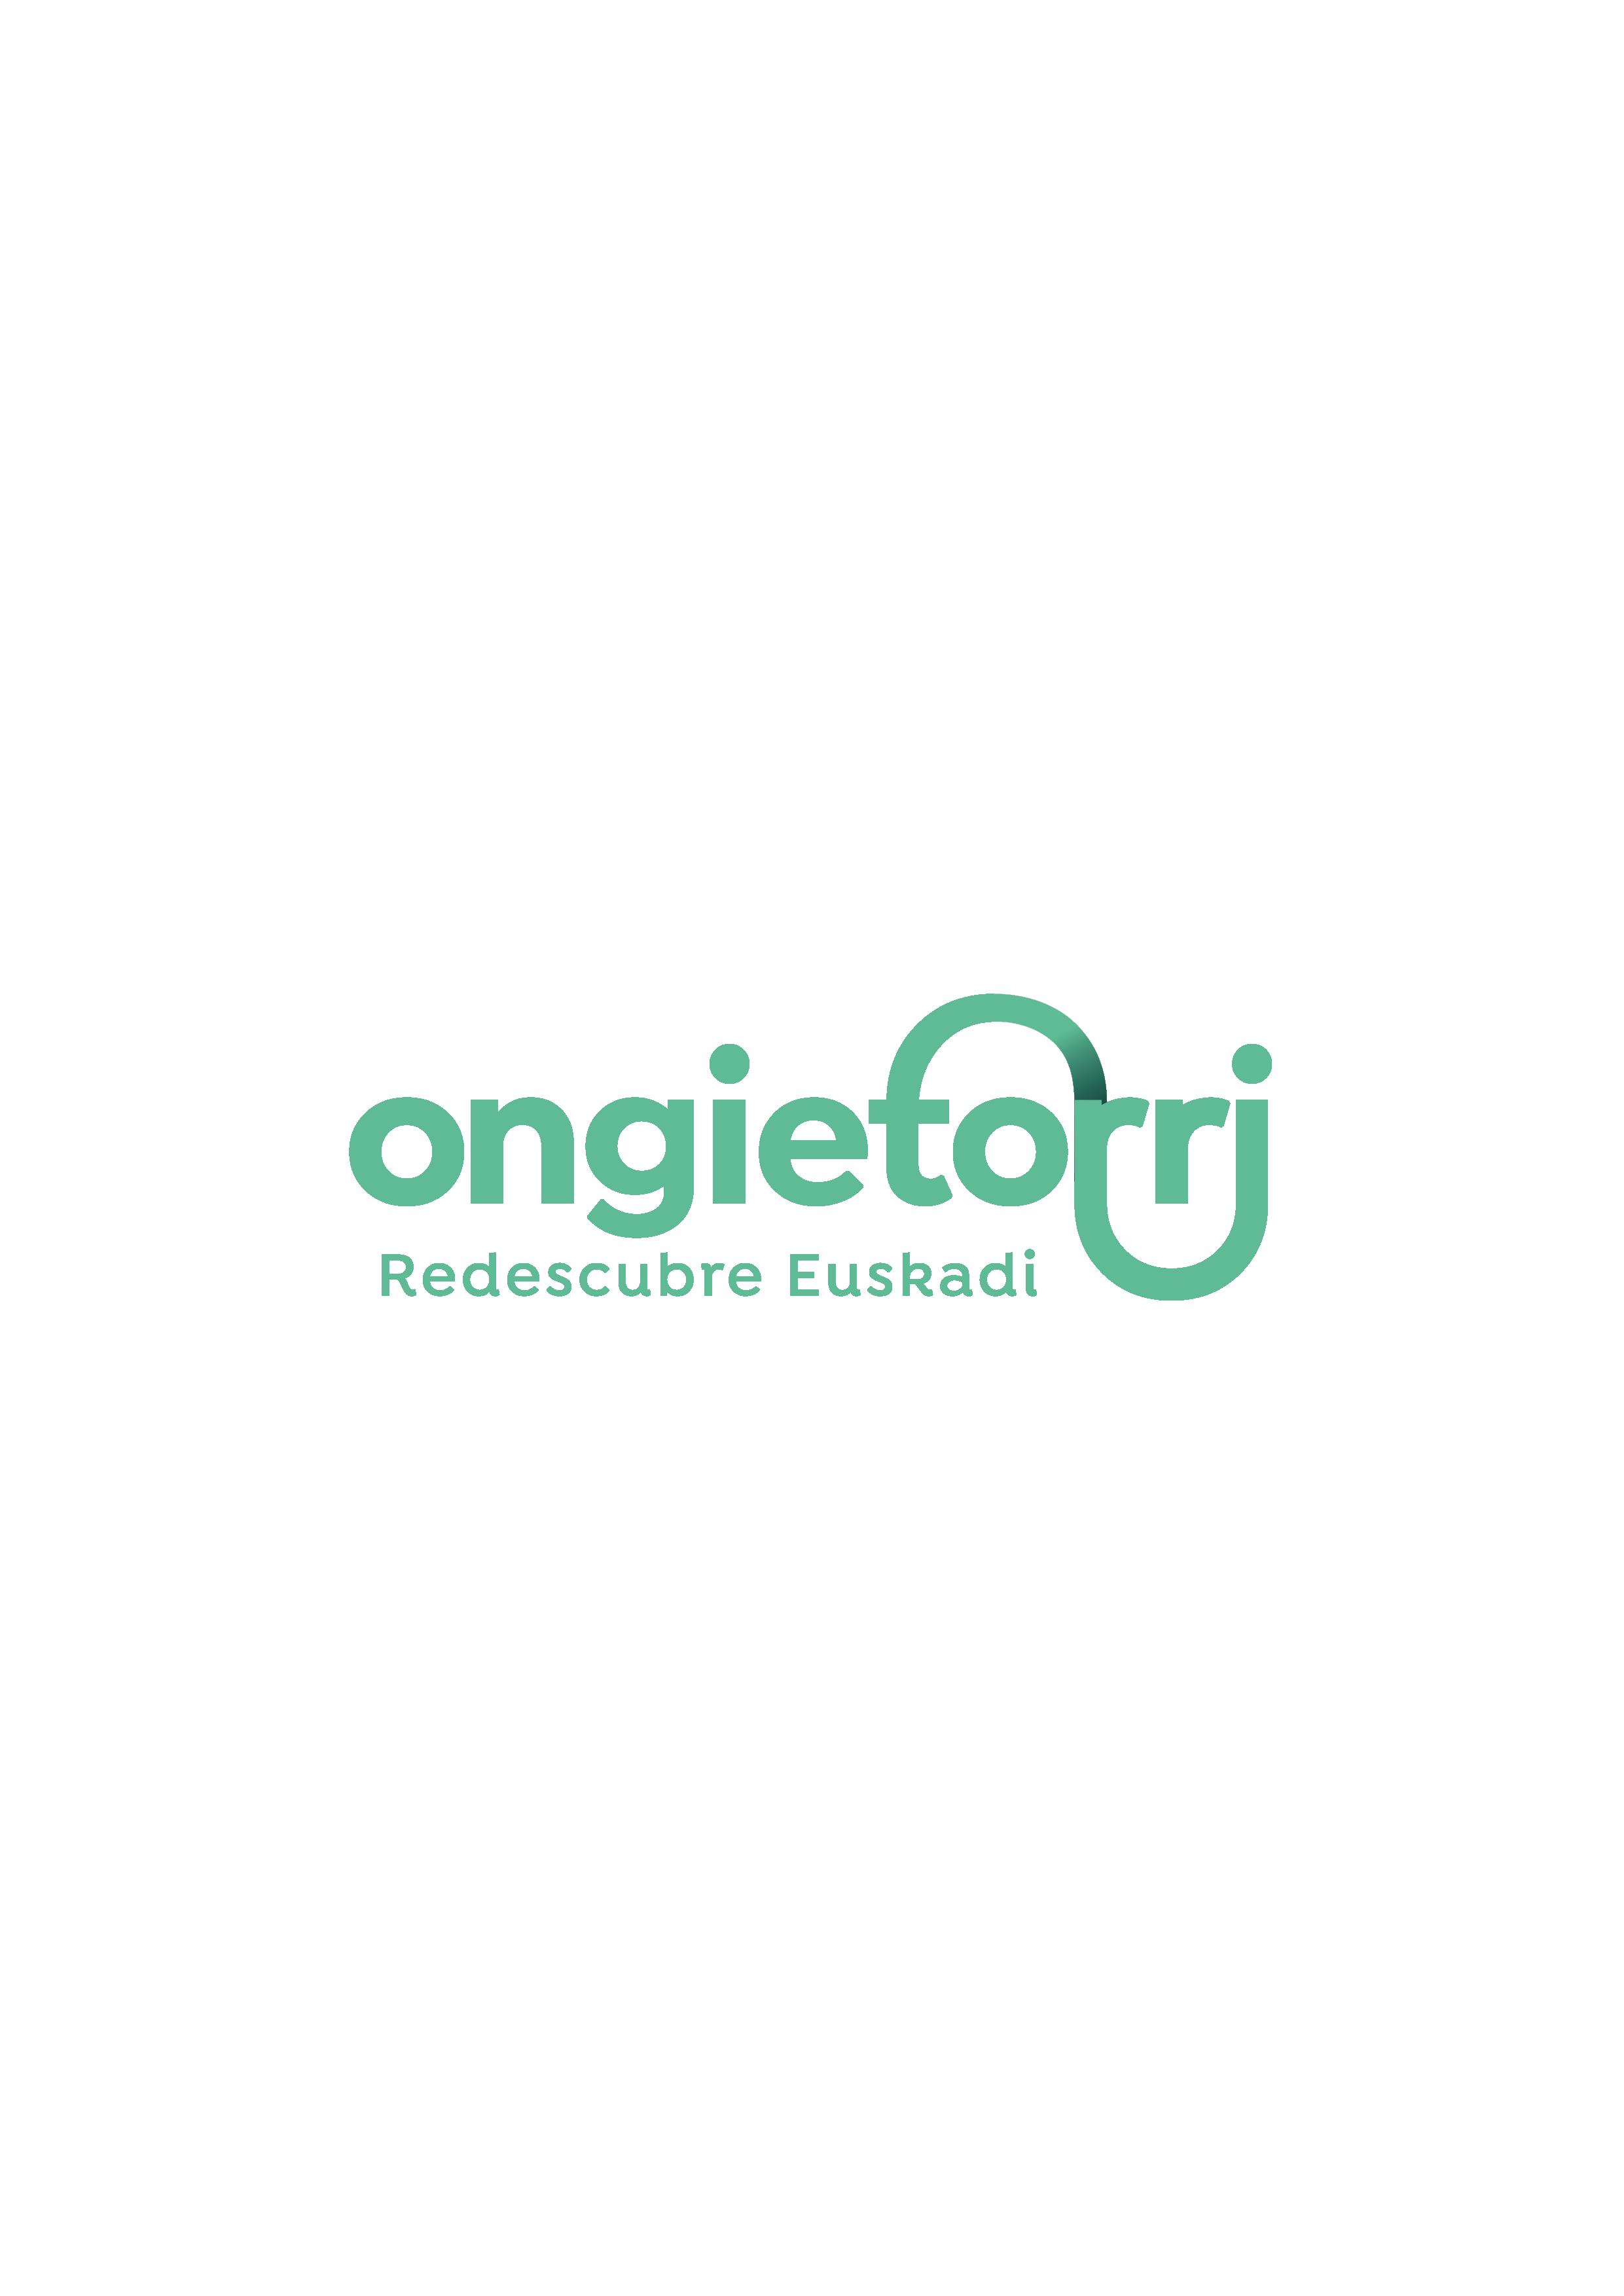 Logo_linea_ongietorri_Mesa_de_trabajo_1.png